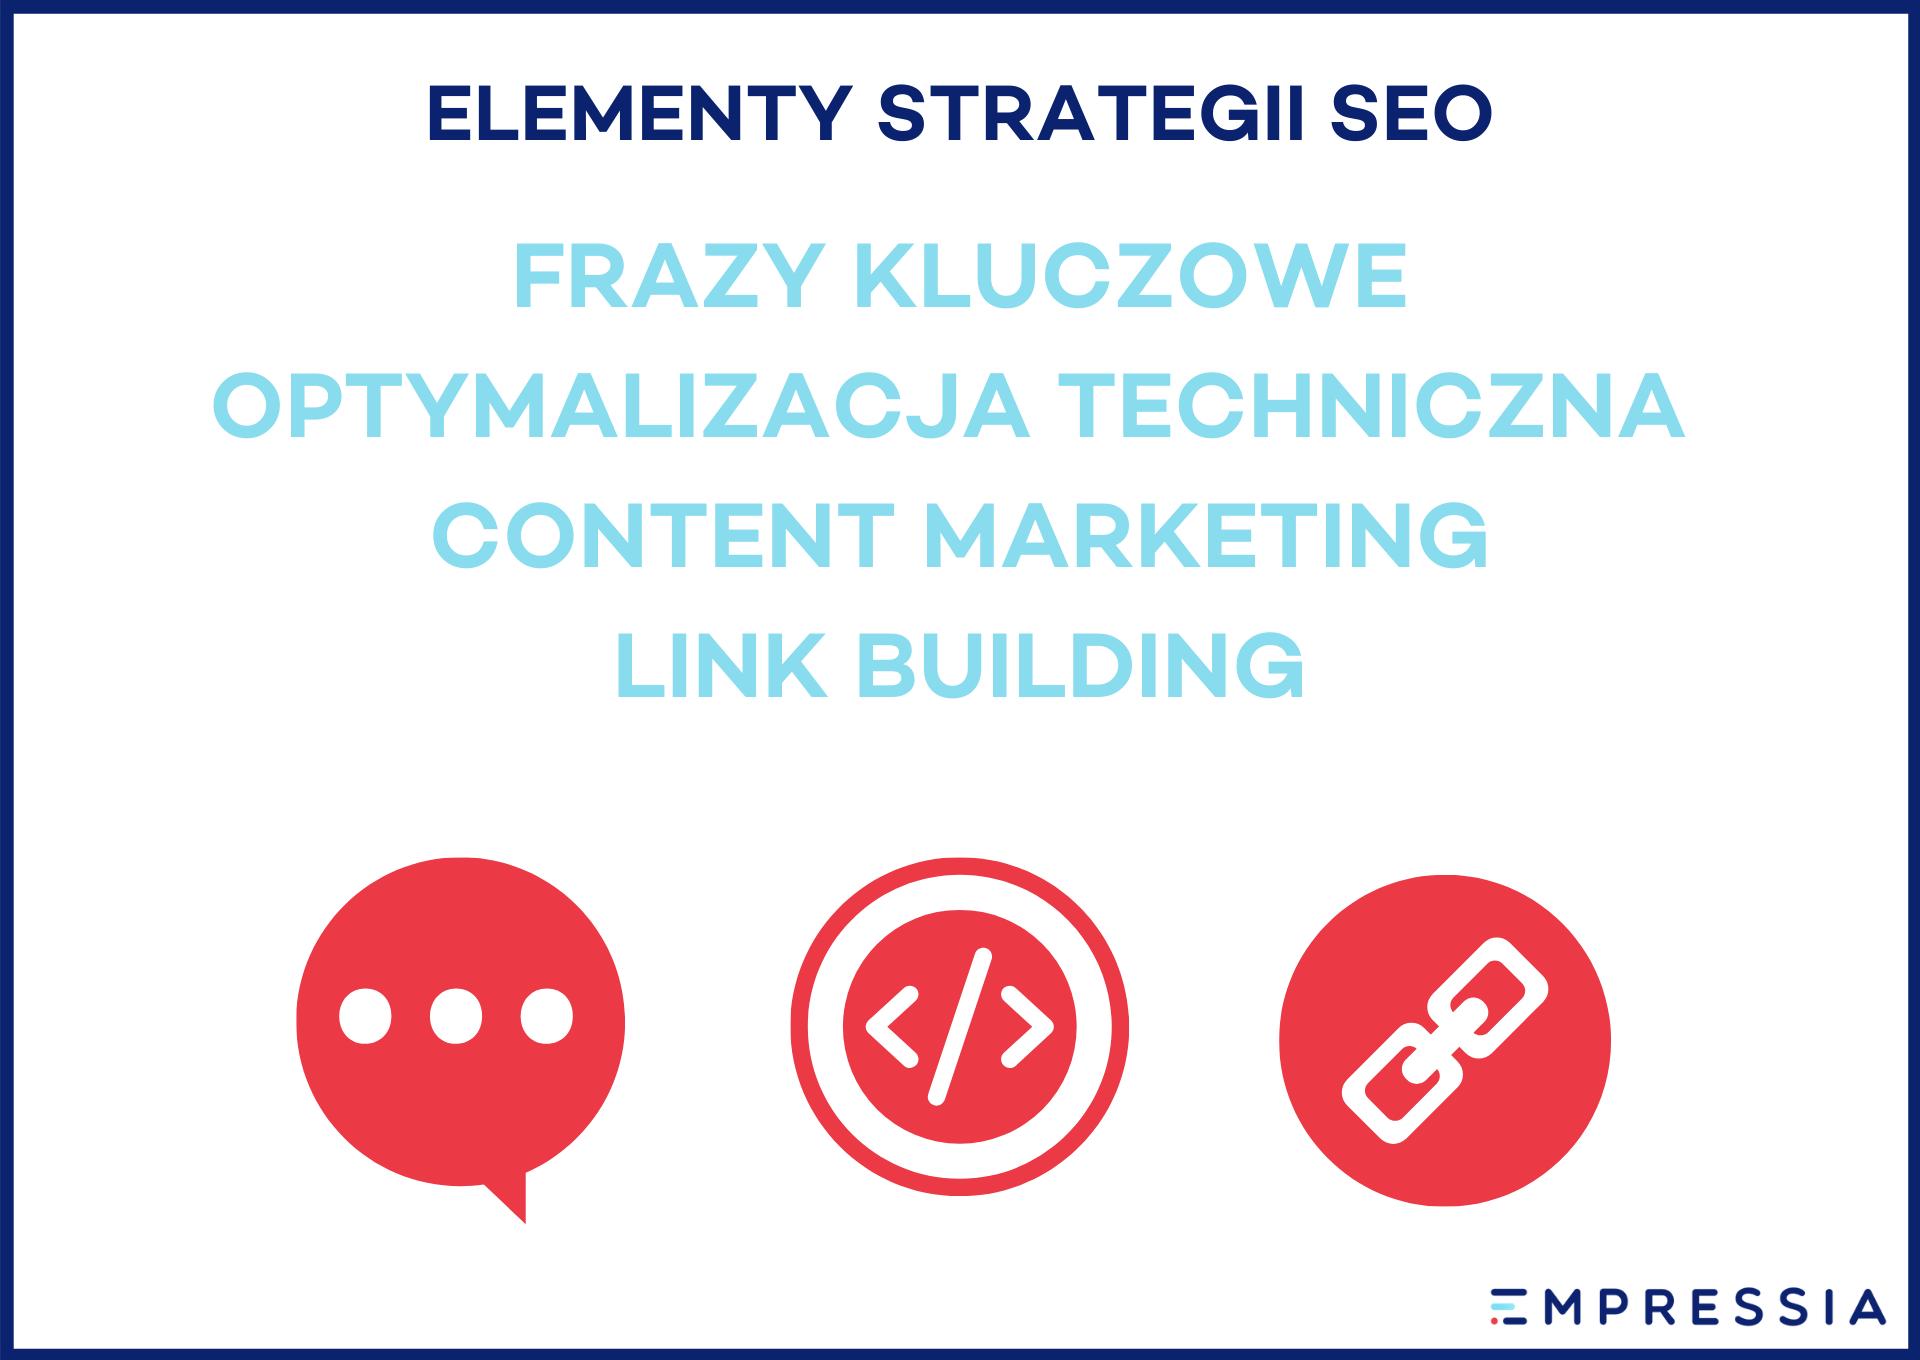 elementy strategii seo